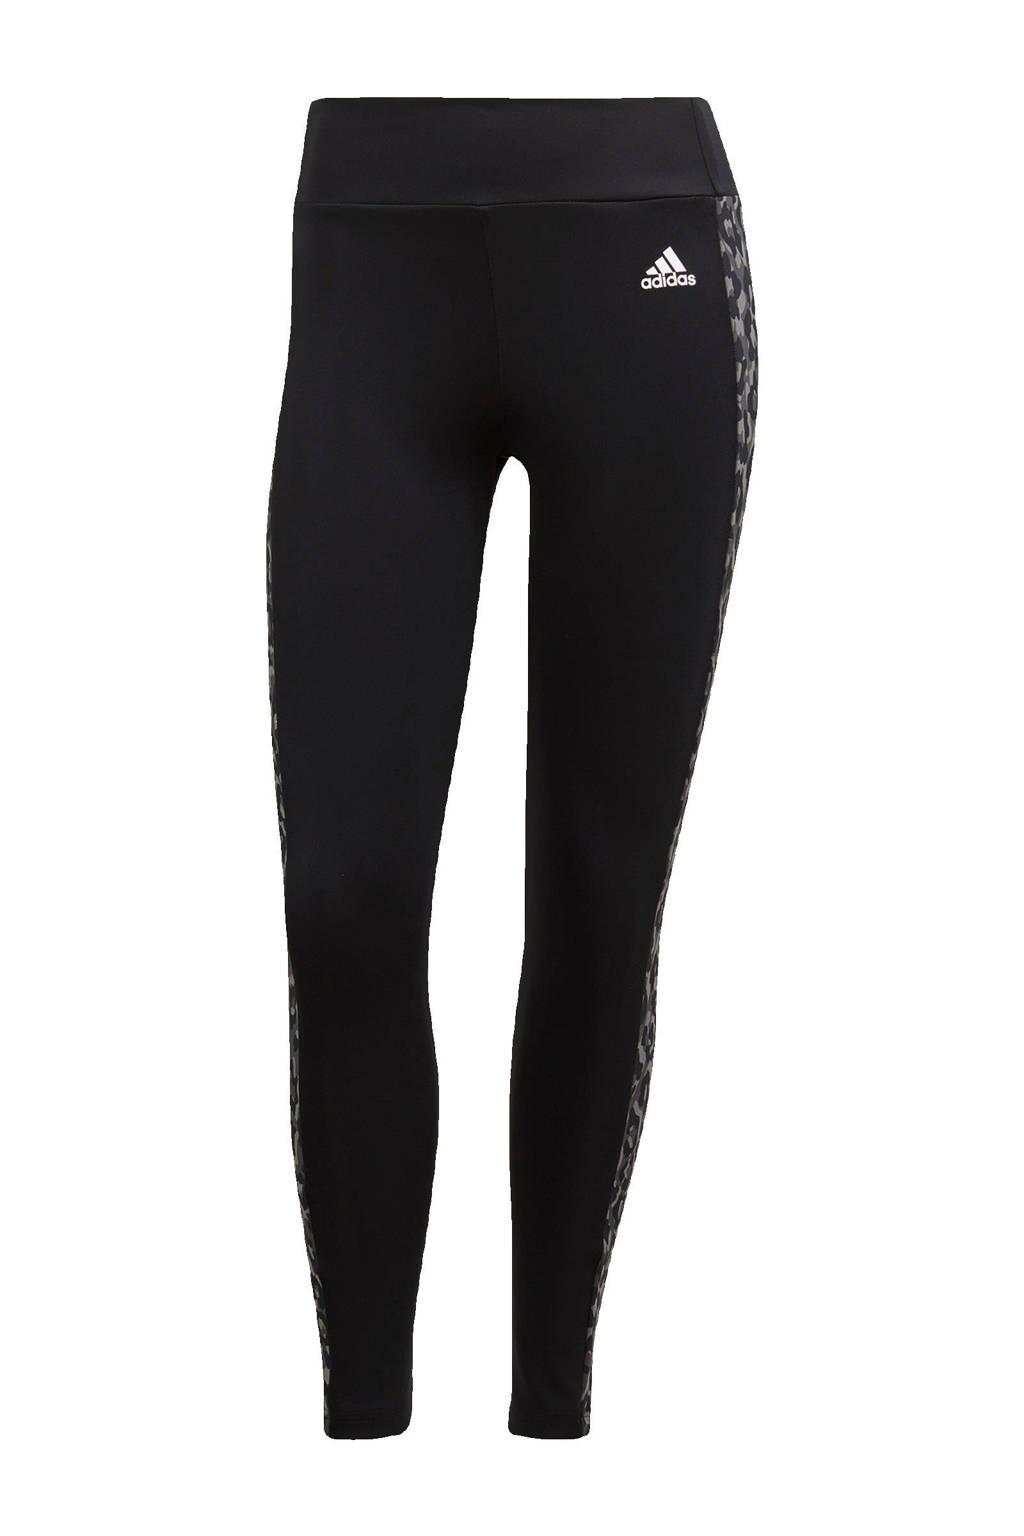 adidas Performance Designed2Move 7/8 sportlegging zwart/grijs, Zwart/grijs